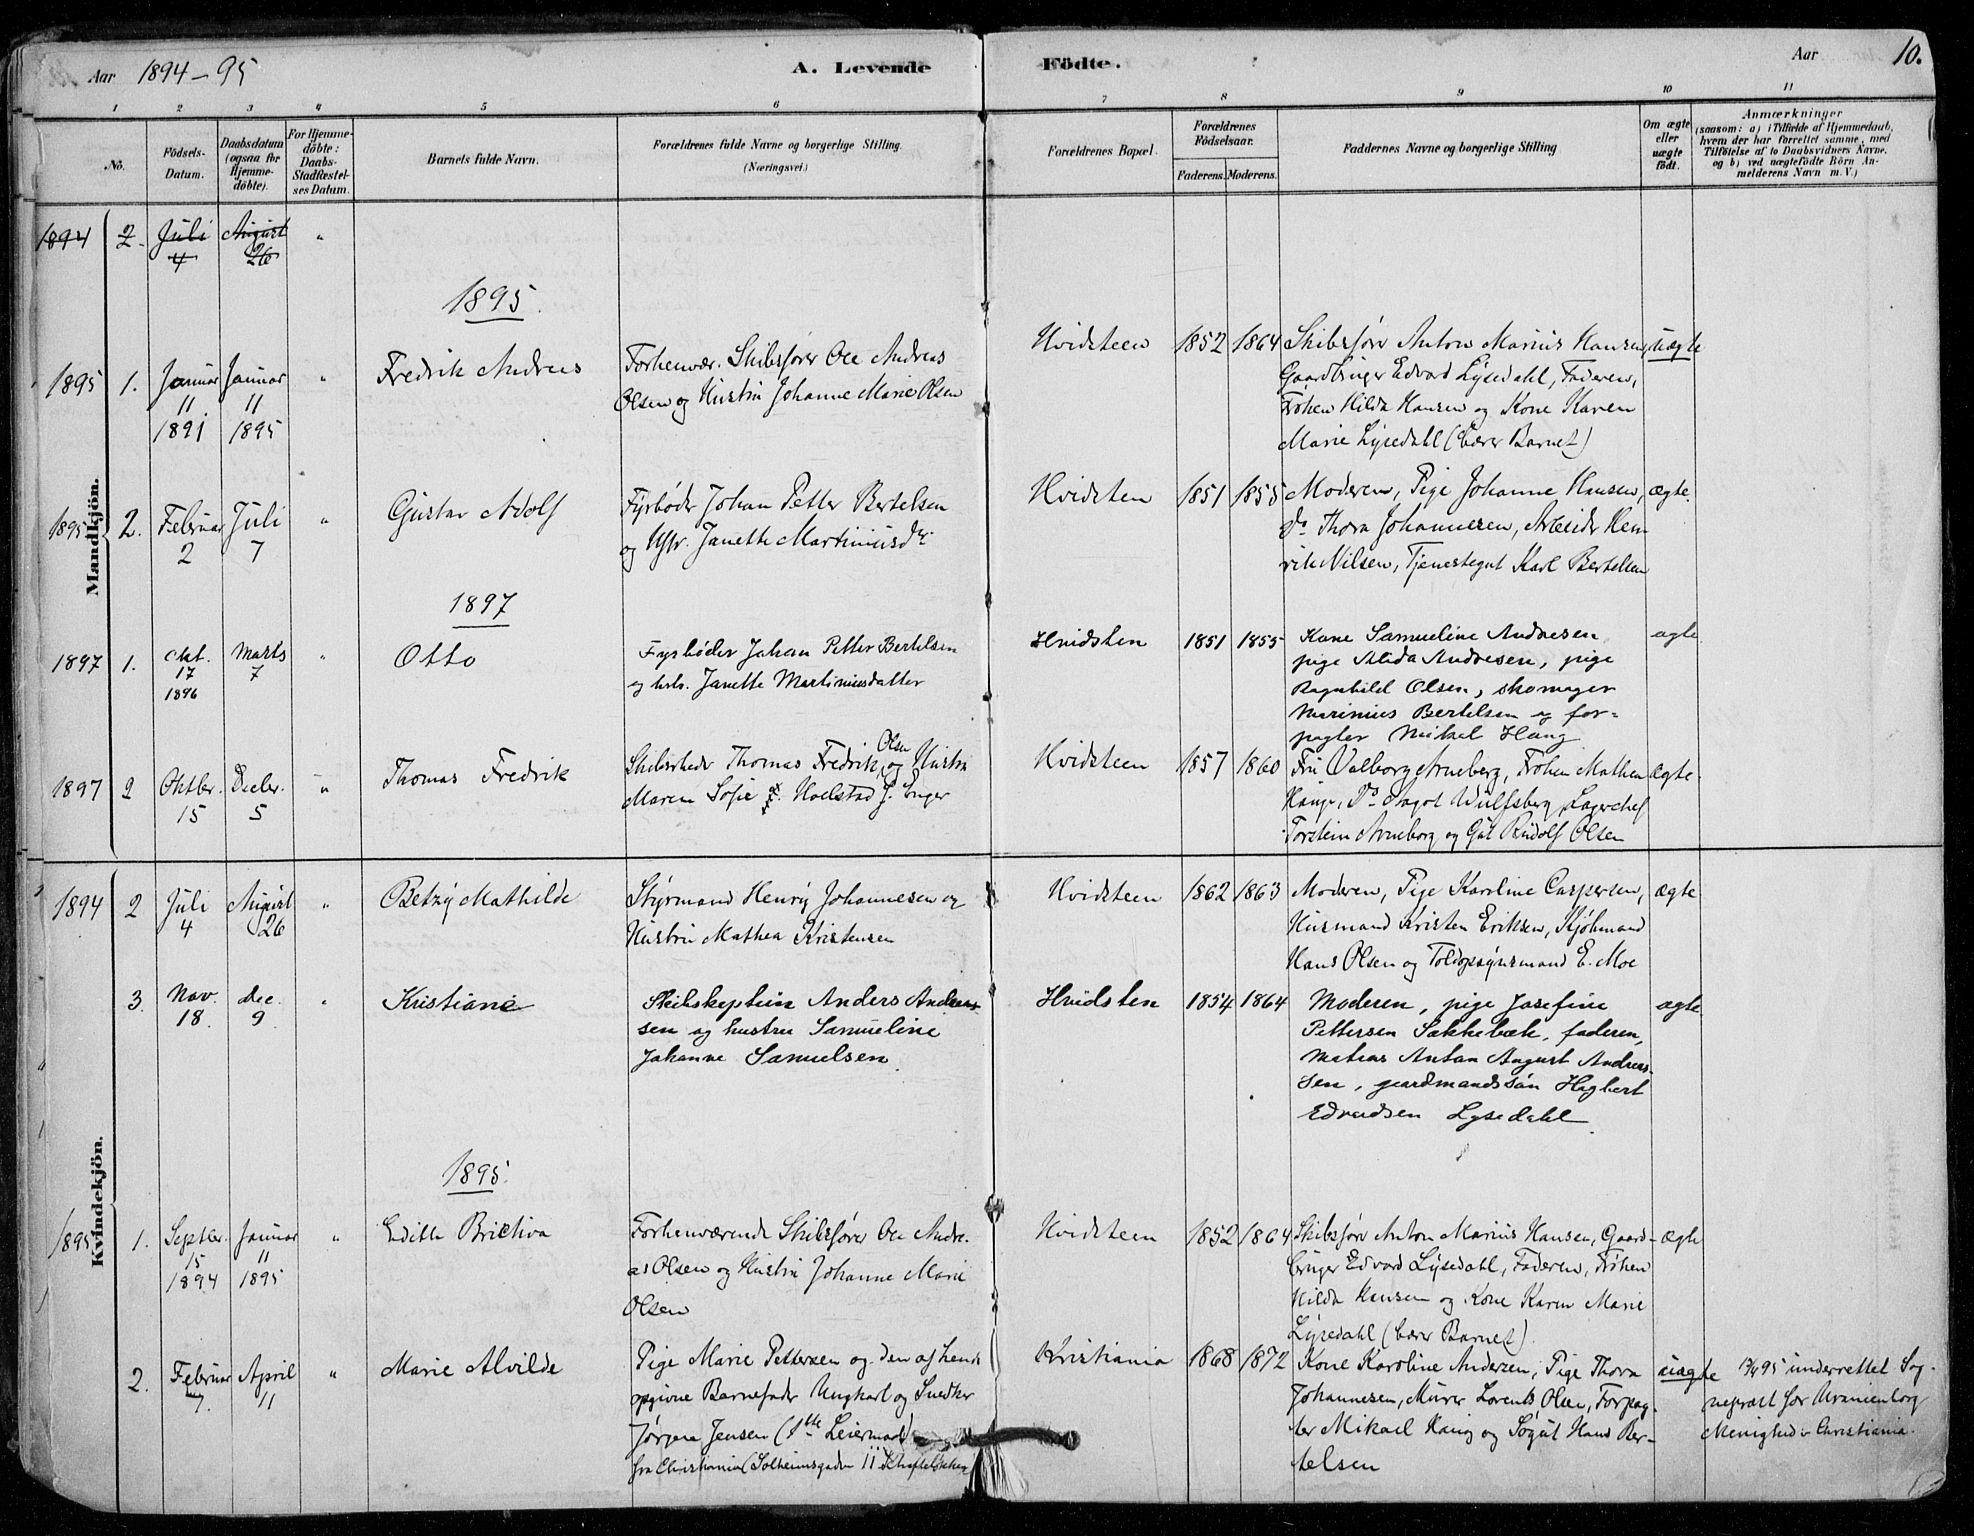 SAO, Vestby prestekontor Kirkebøker, F/Fd/L0001: Ministerialbok nr. IV 1, 1878-1945, s. 10